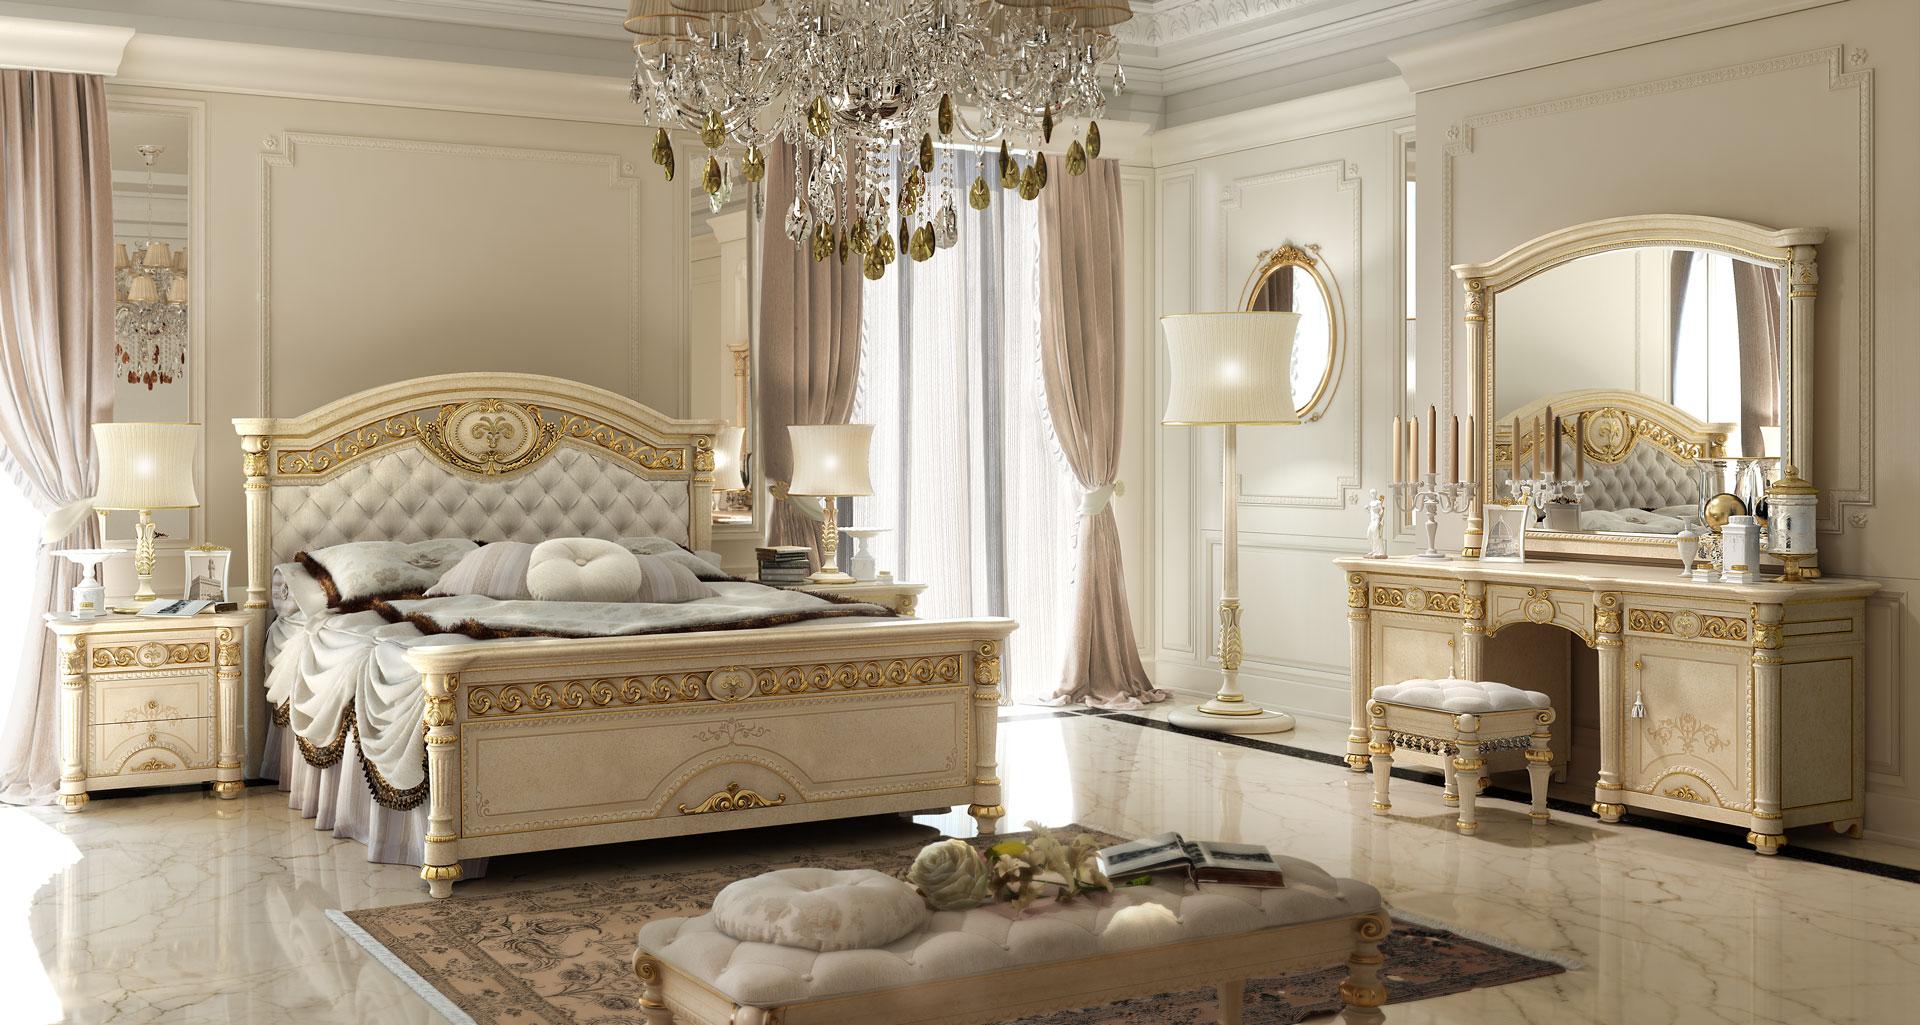 Camere da letto classiche - Camere da letto classiche prezzi ...